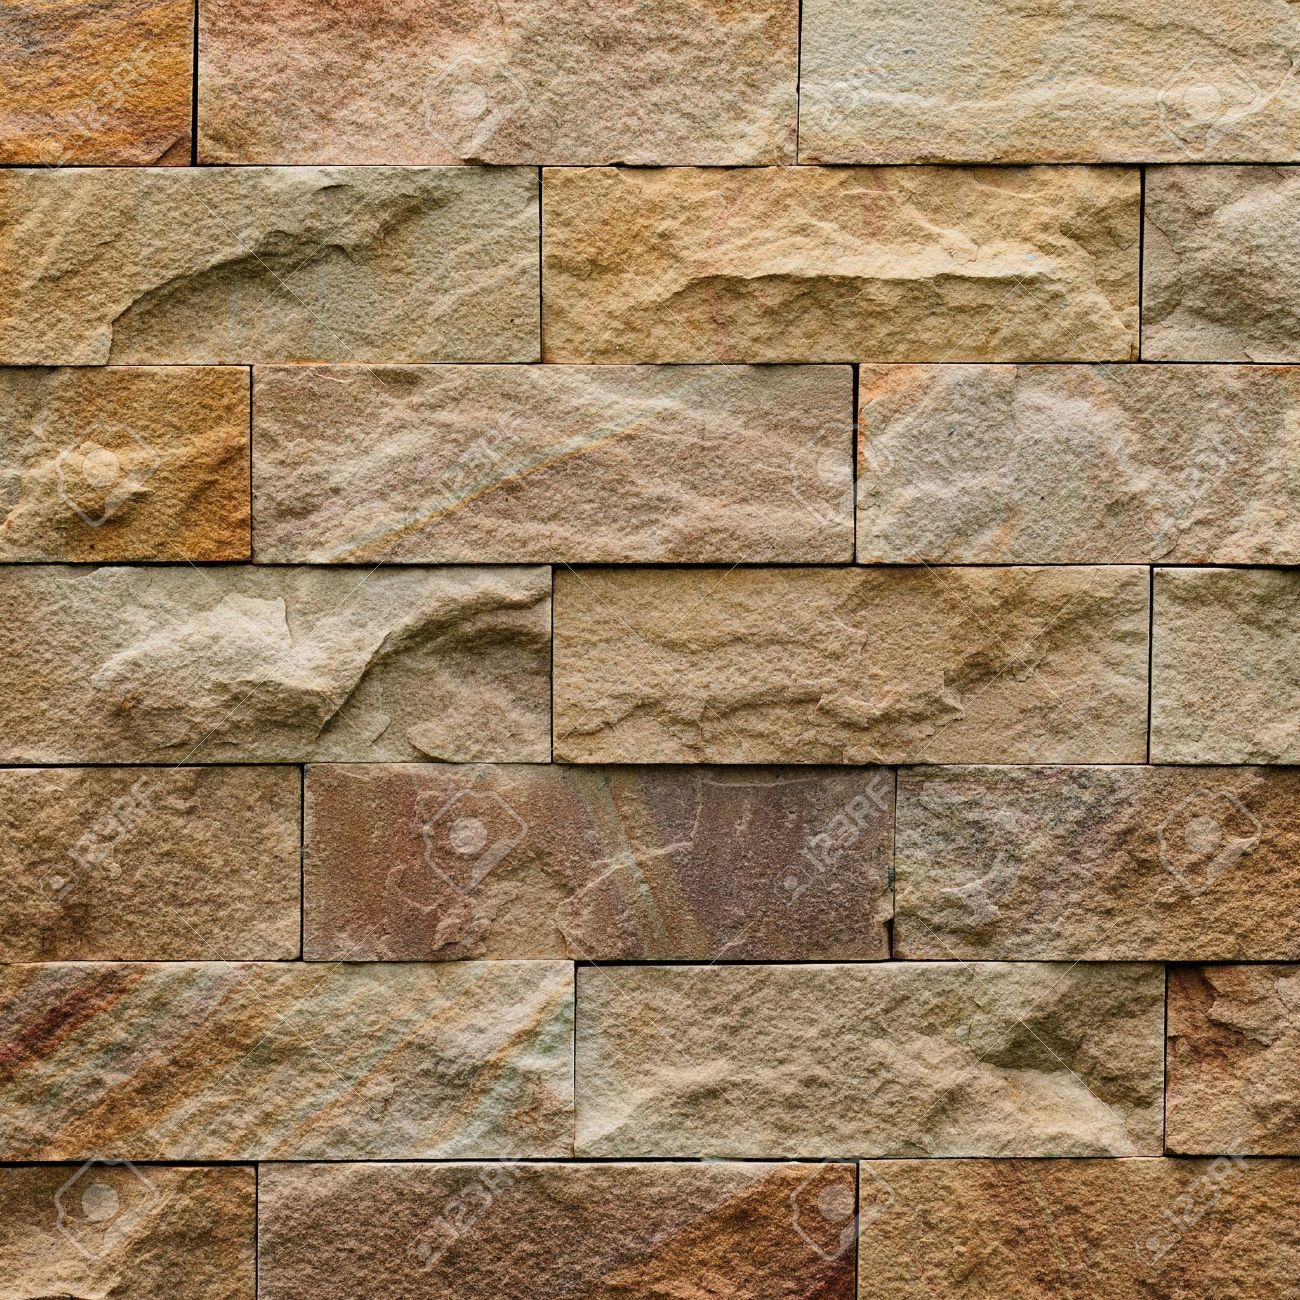 stone wall texture brick wall